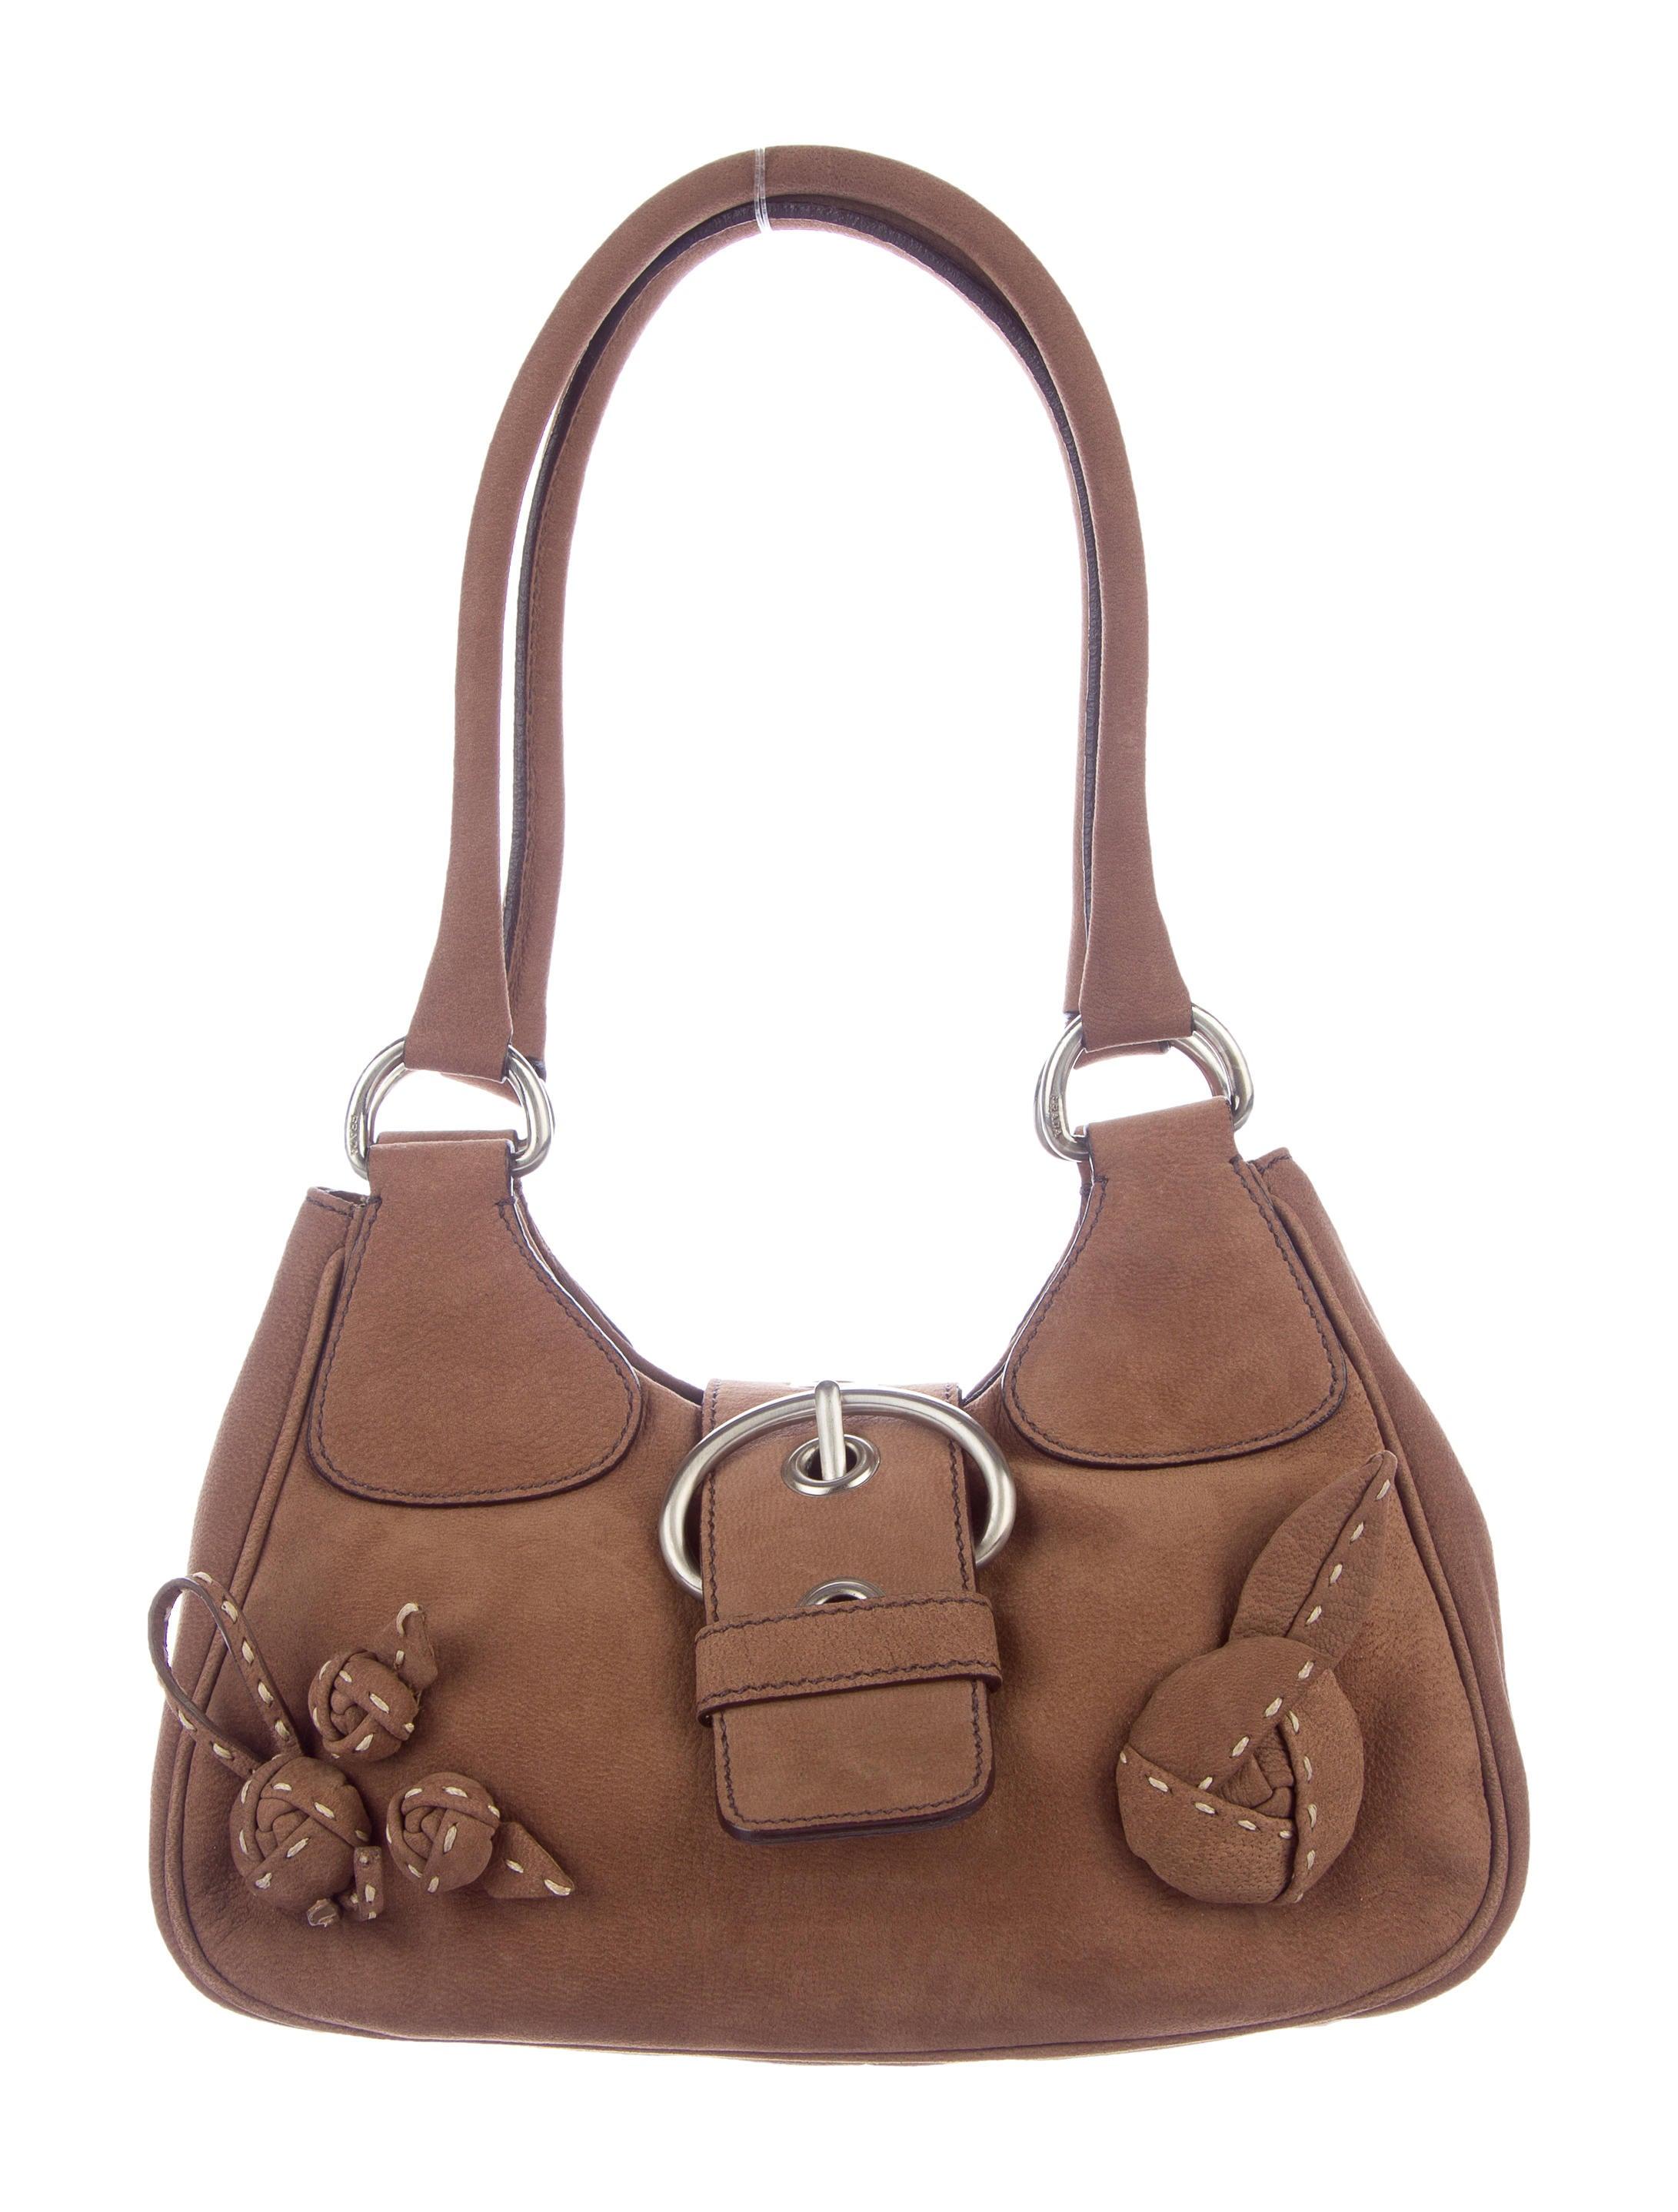 Prada Nubuck Shoulder Bag Handbags Pra164202 The